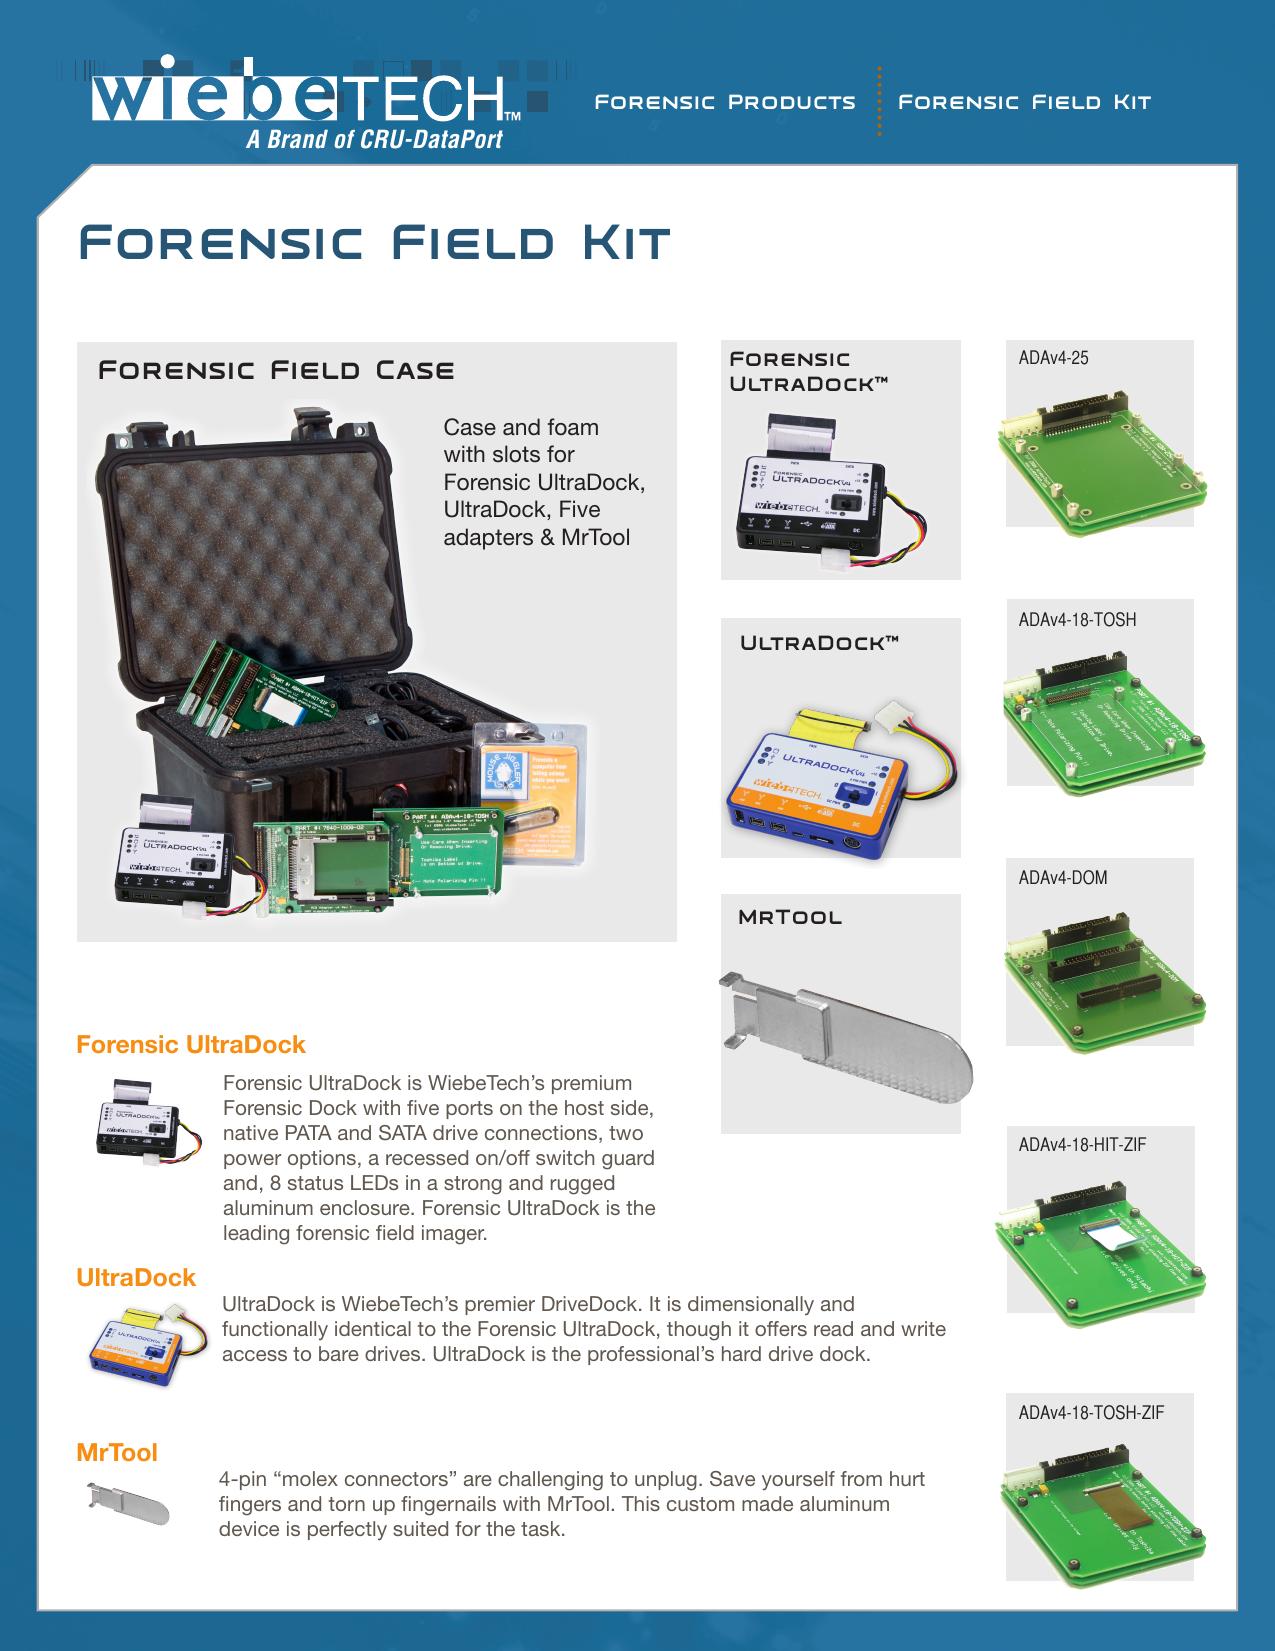 Forensic Field Kit Known As Fastbloc Manualzz